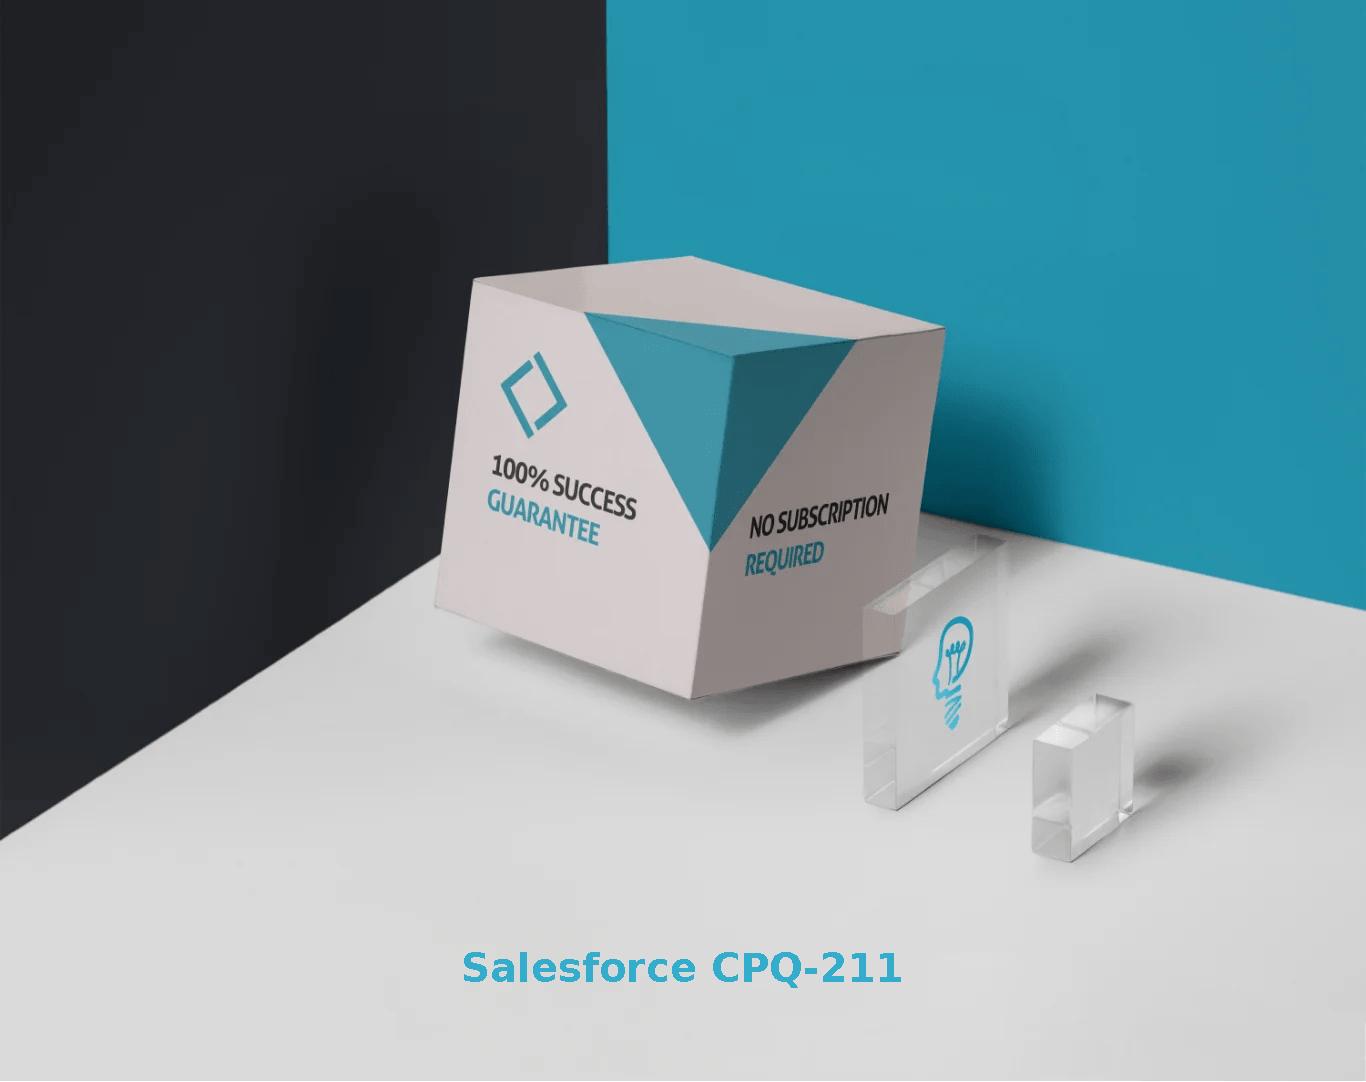 Salesforce CPQ-211 Exams